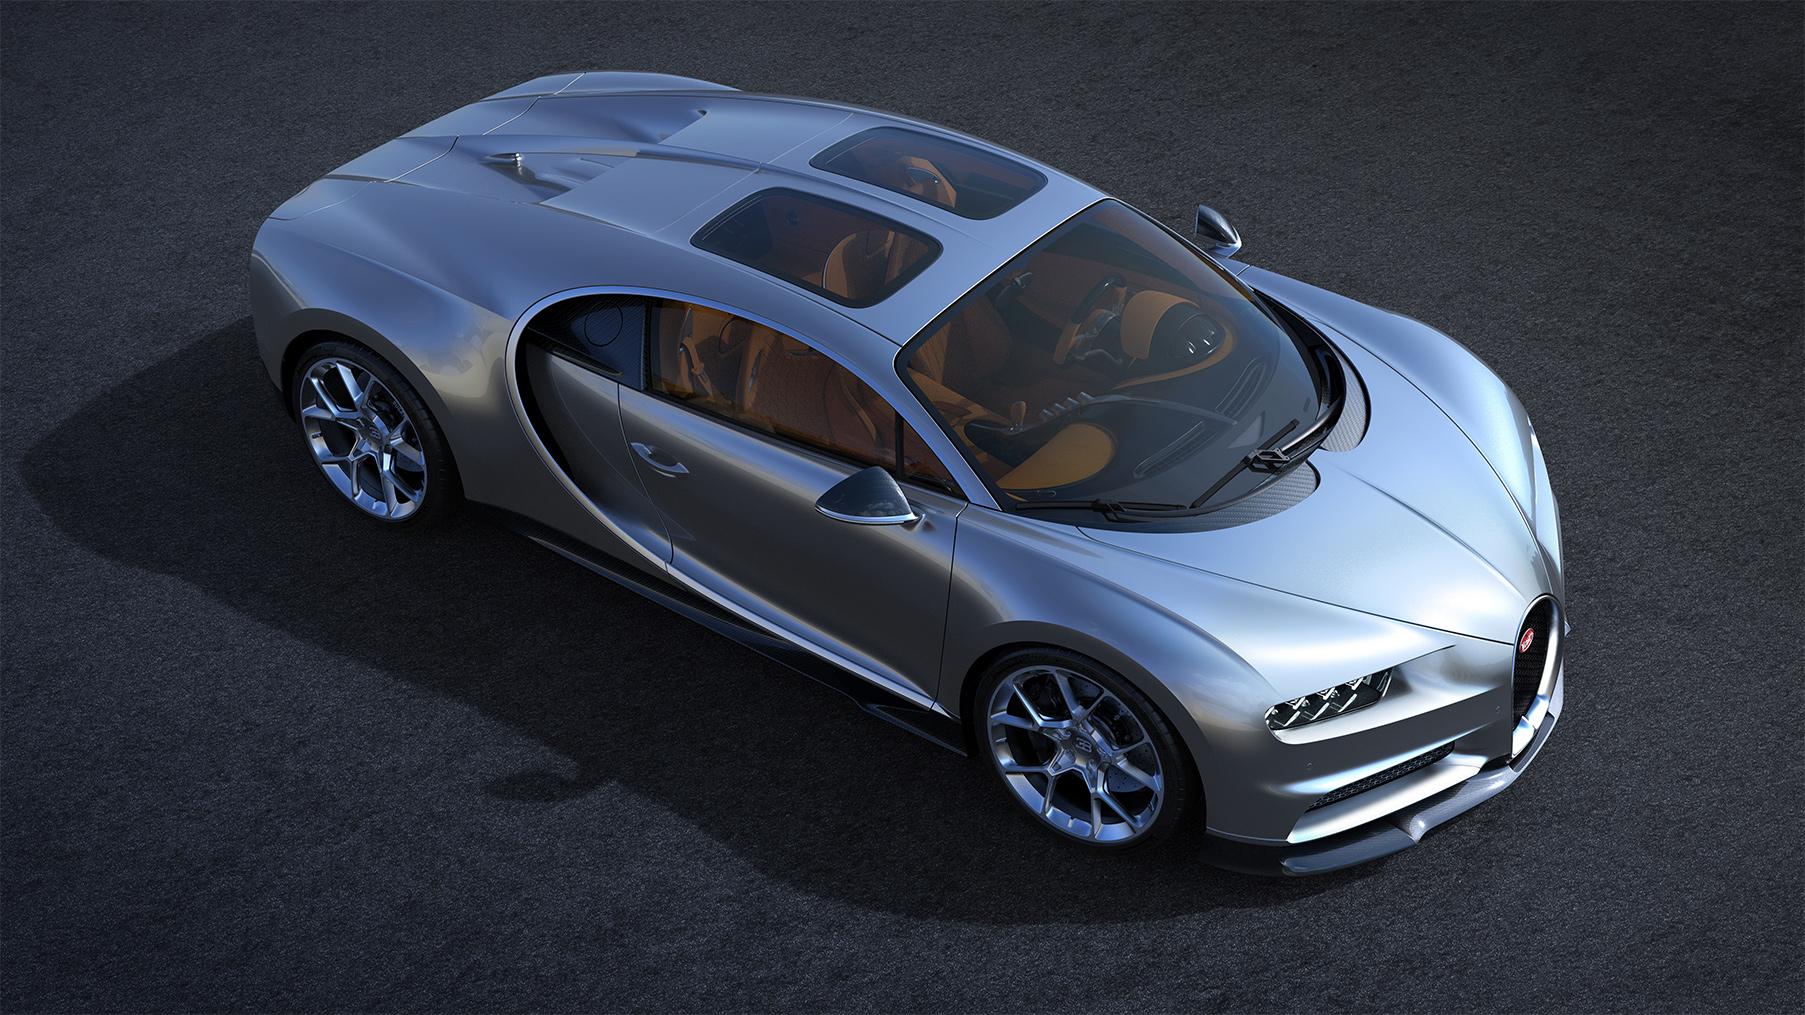 TrackWorthy - Bugatti Chiron Sky View (1)